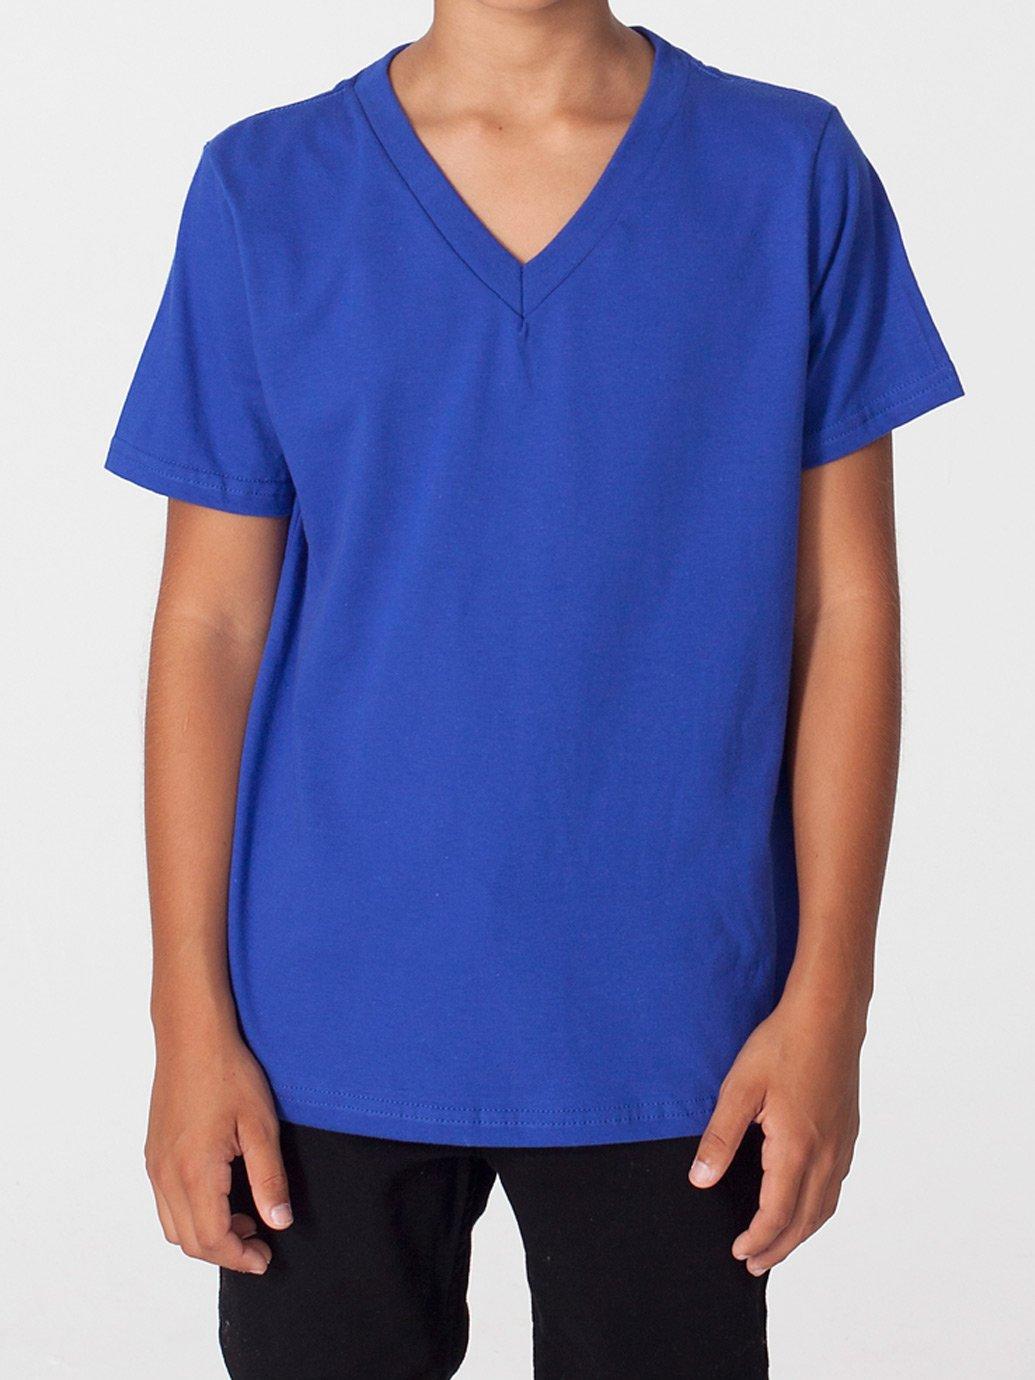 e9c70e1d7d American Apparel Youth Fine Jersey V-Neck T-Shirt - Evan Webster INK